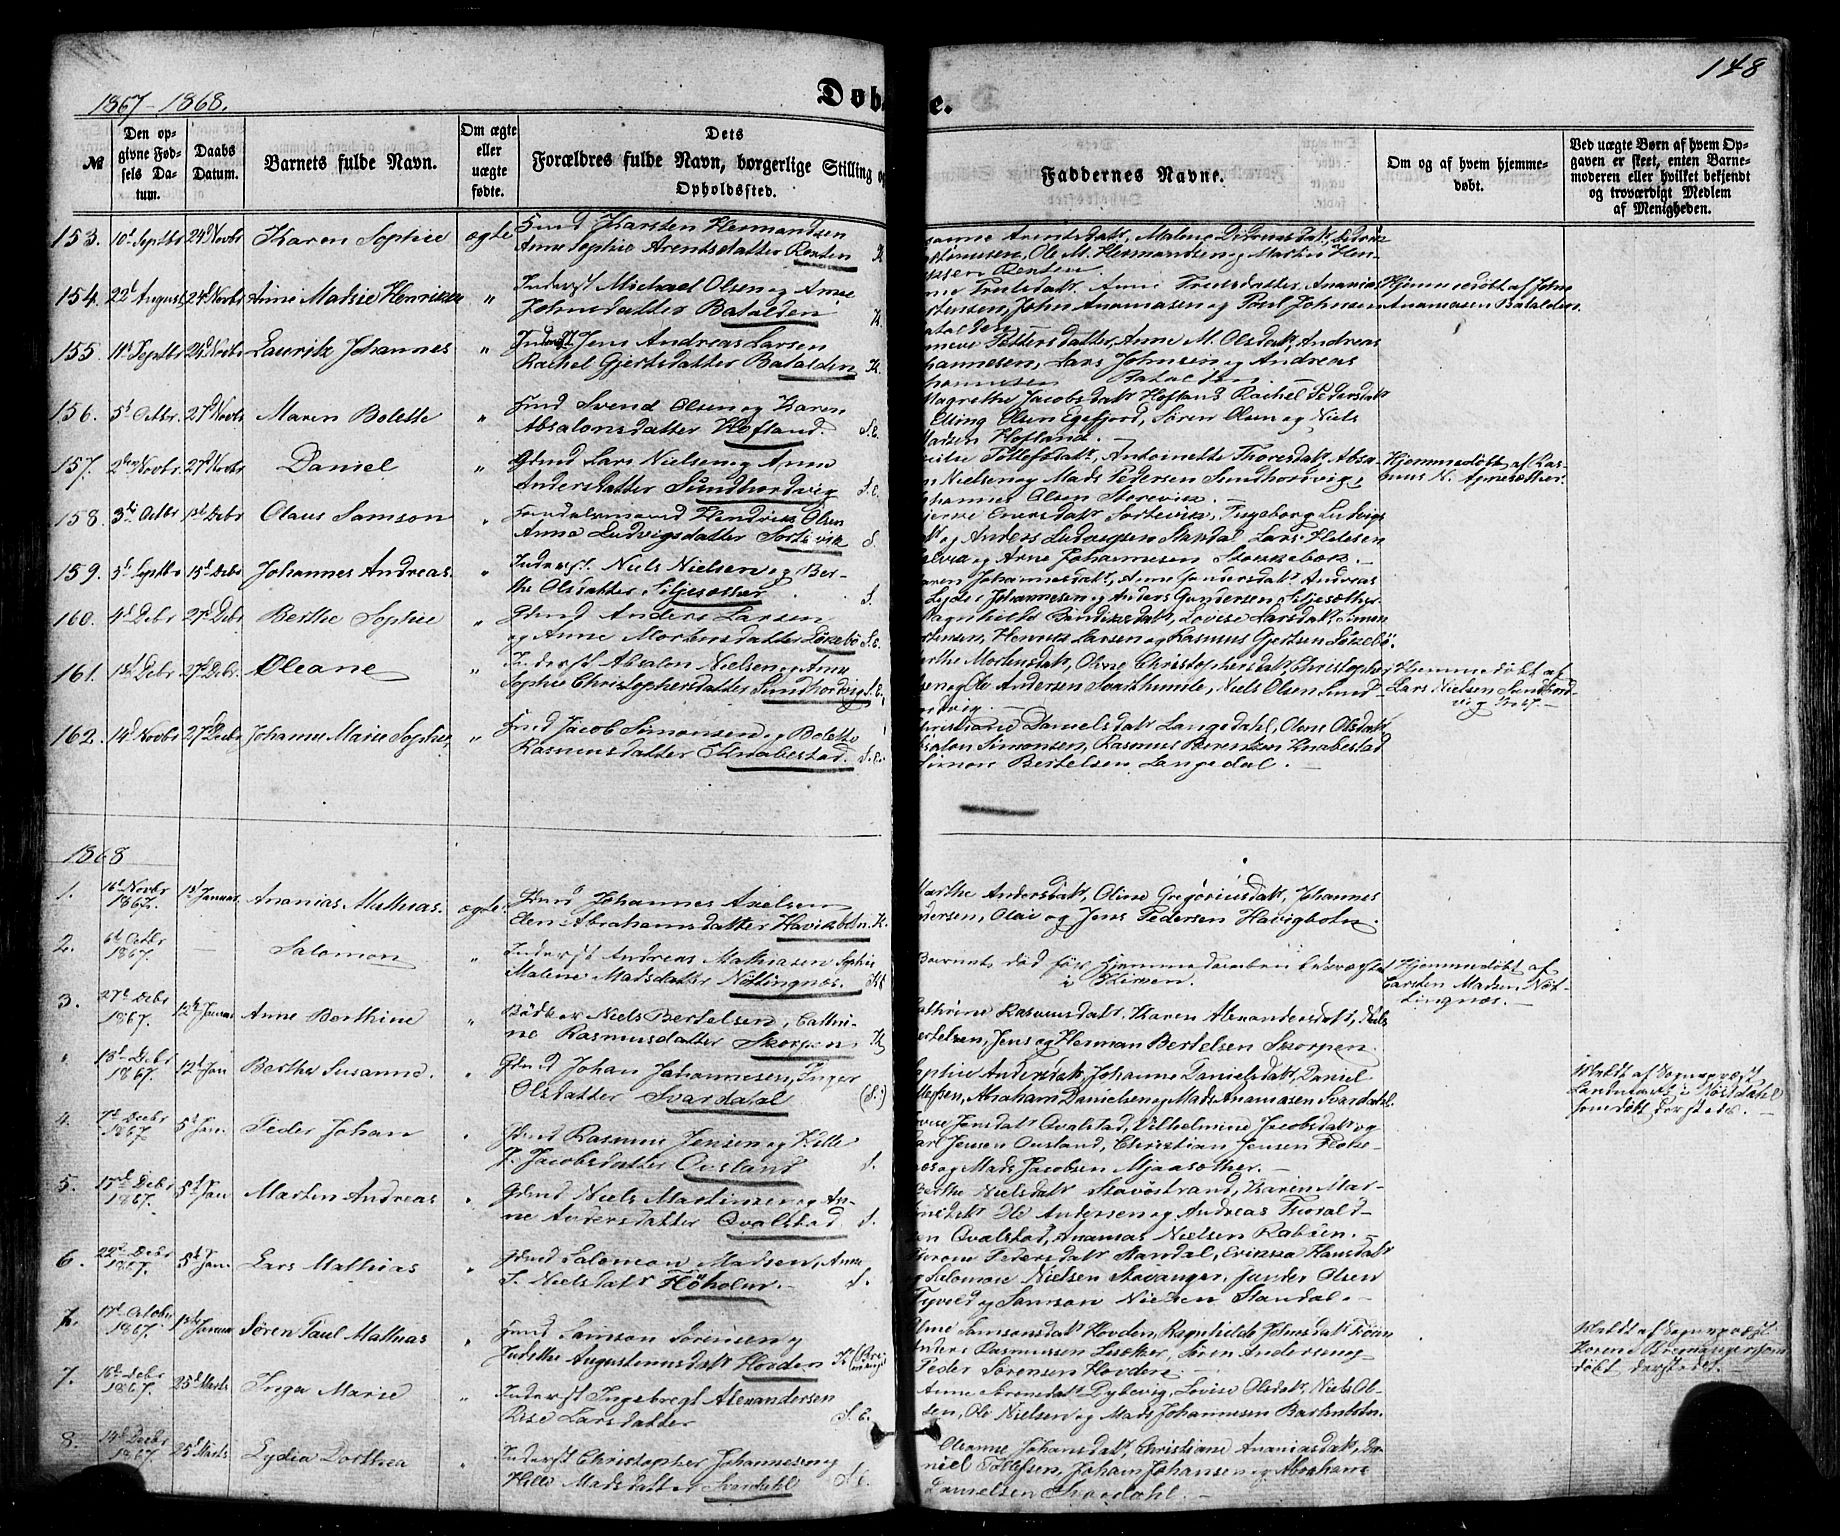 SAB, Kinn sokneprestembete, H/Haa/Haaa/L0006: Ministerialbok nr. A 6, 1857-1885, s. 148